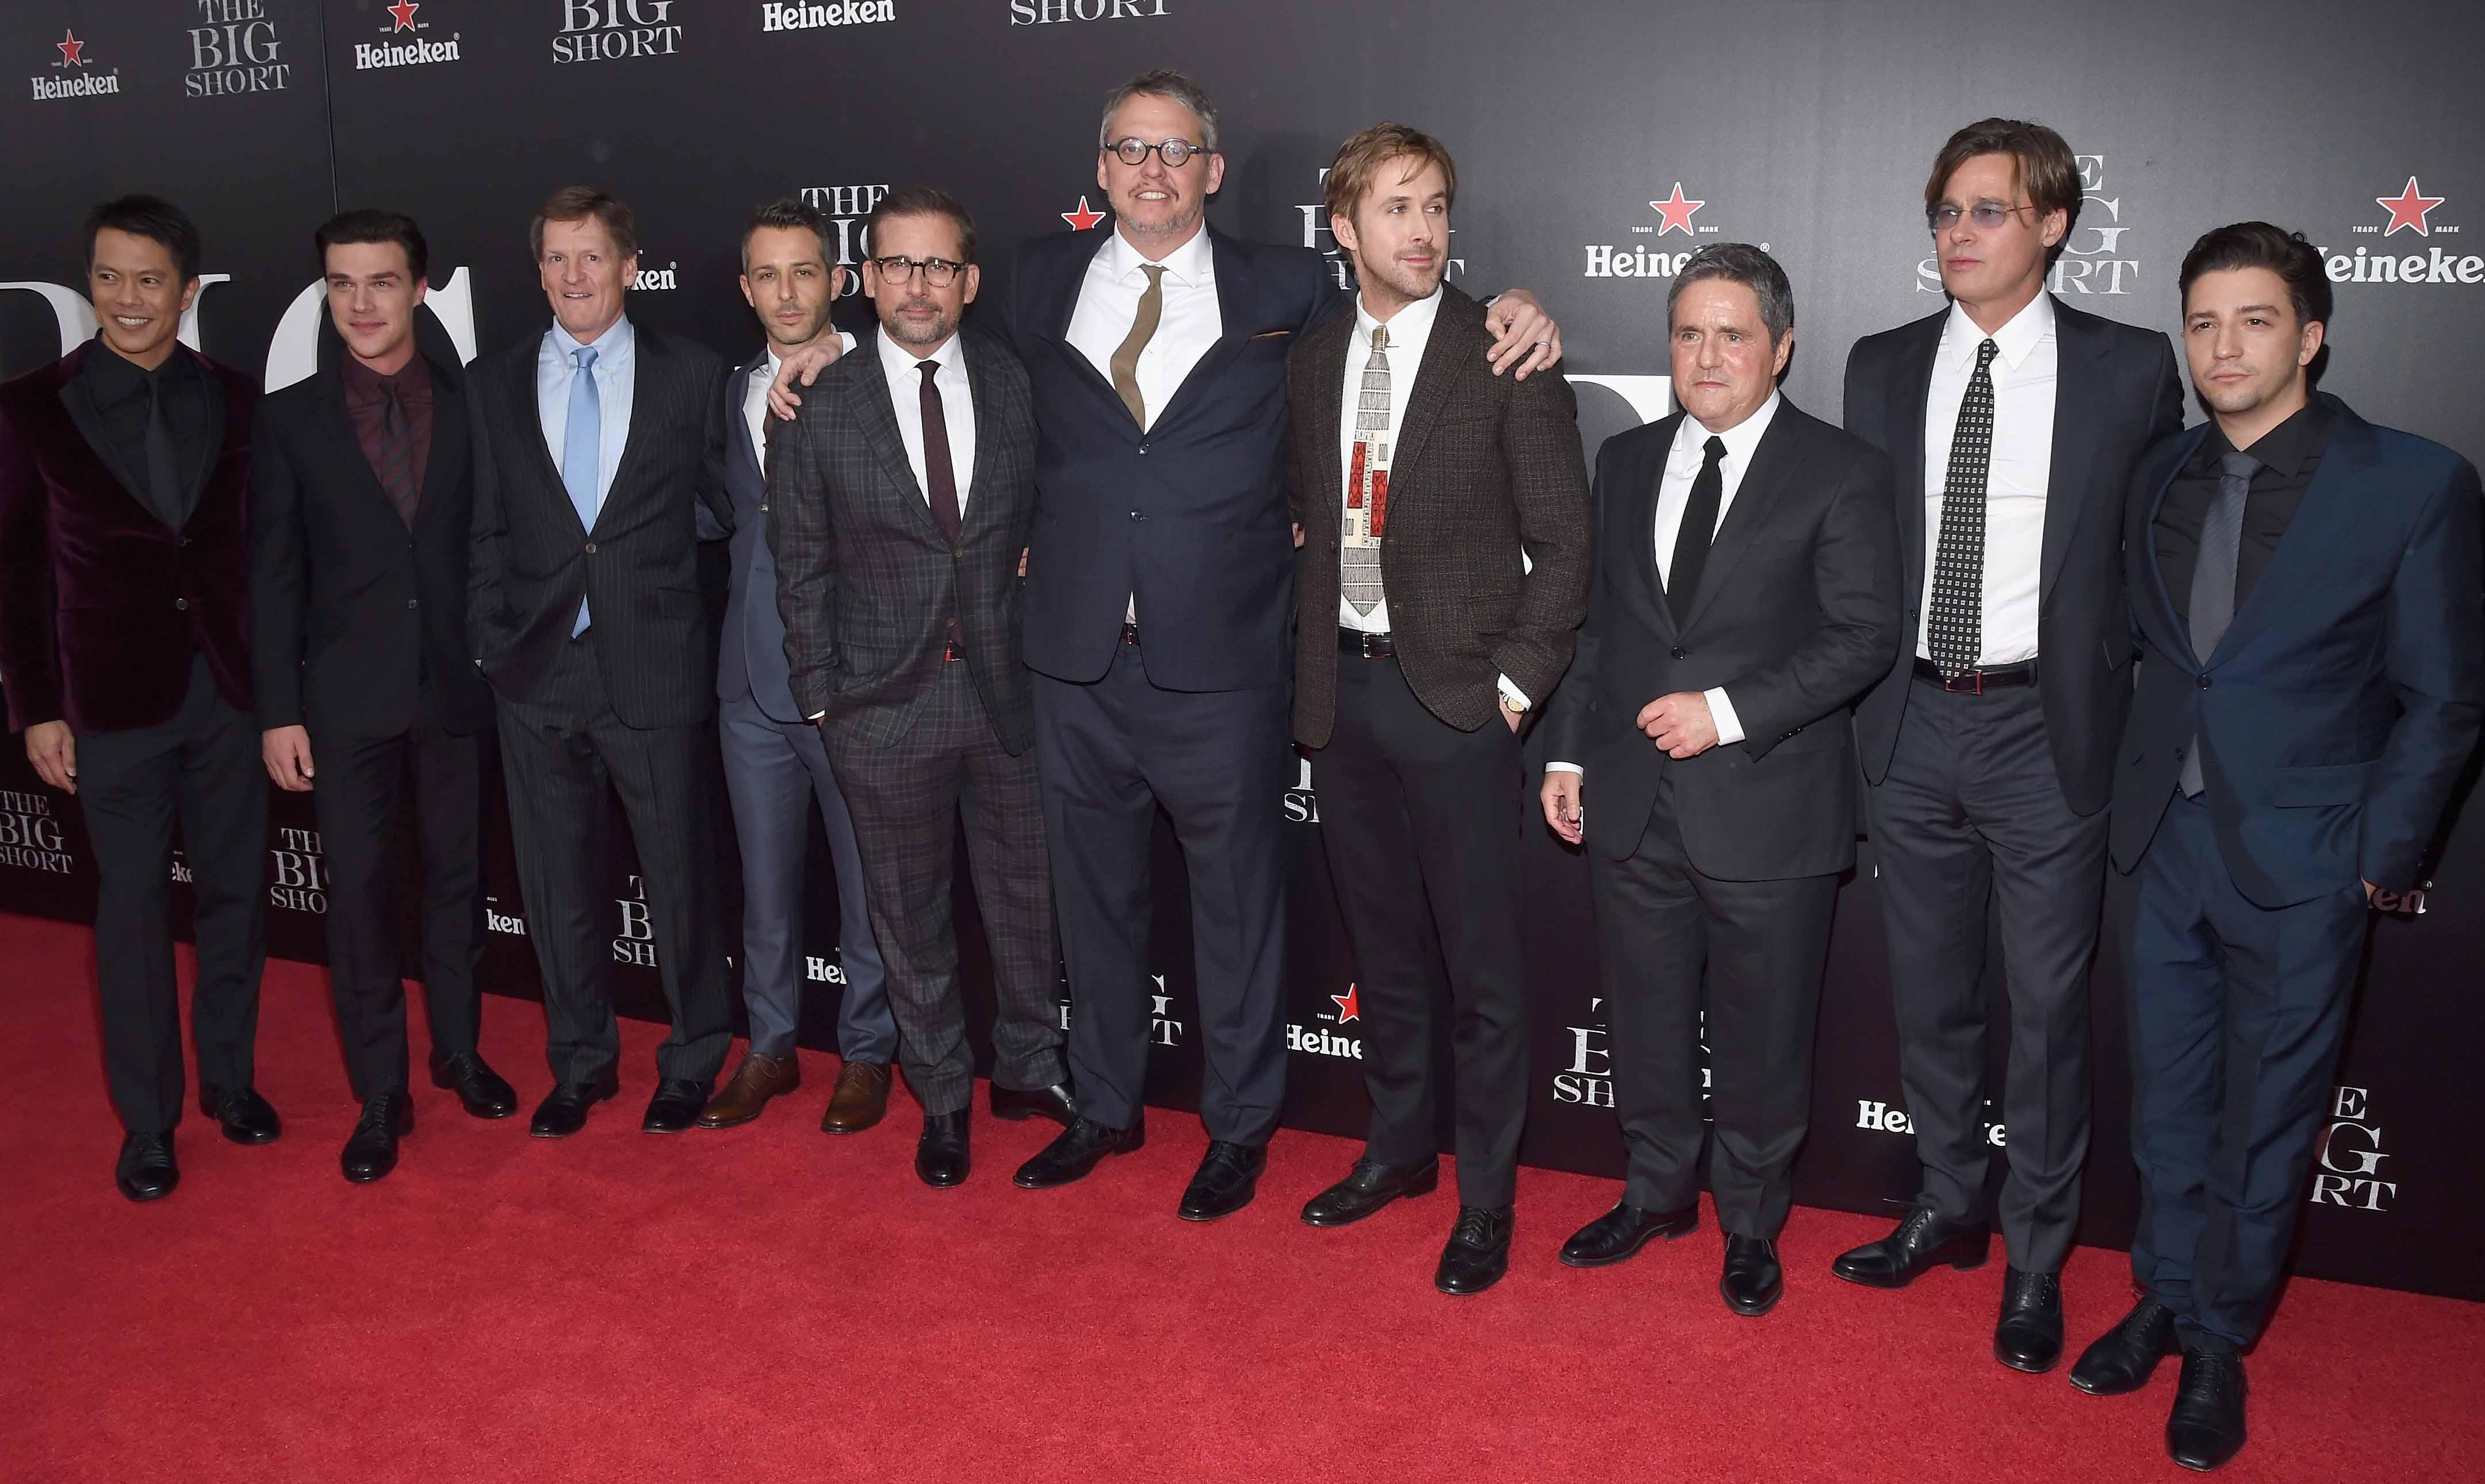 Ryan Gosling Brad Pitt Amp More Walk The Big Short Red